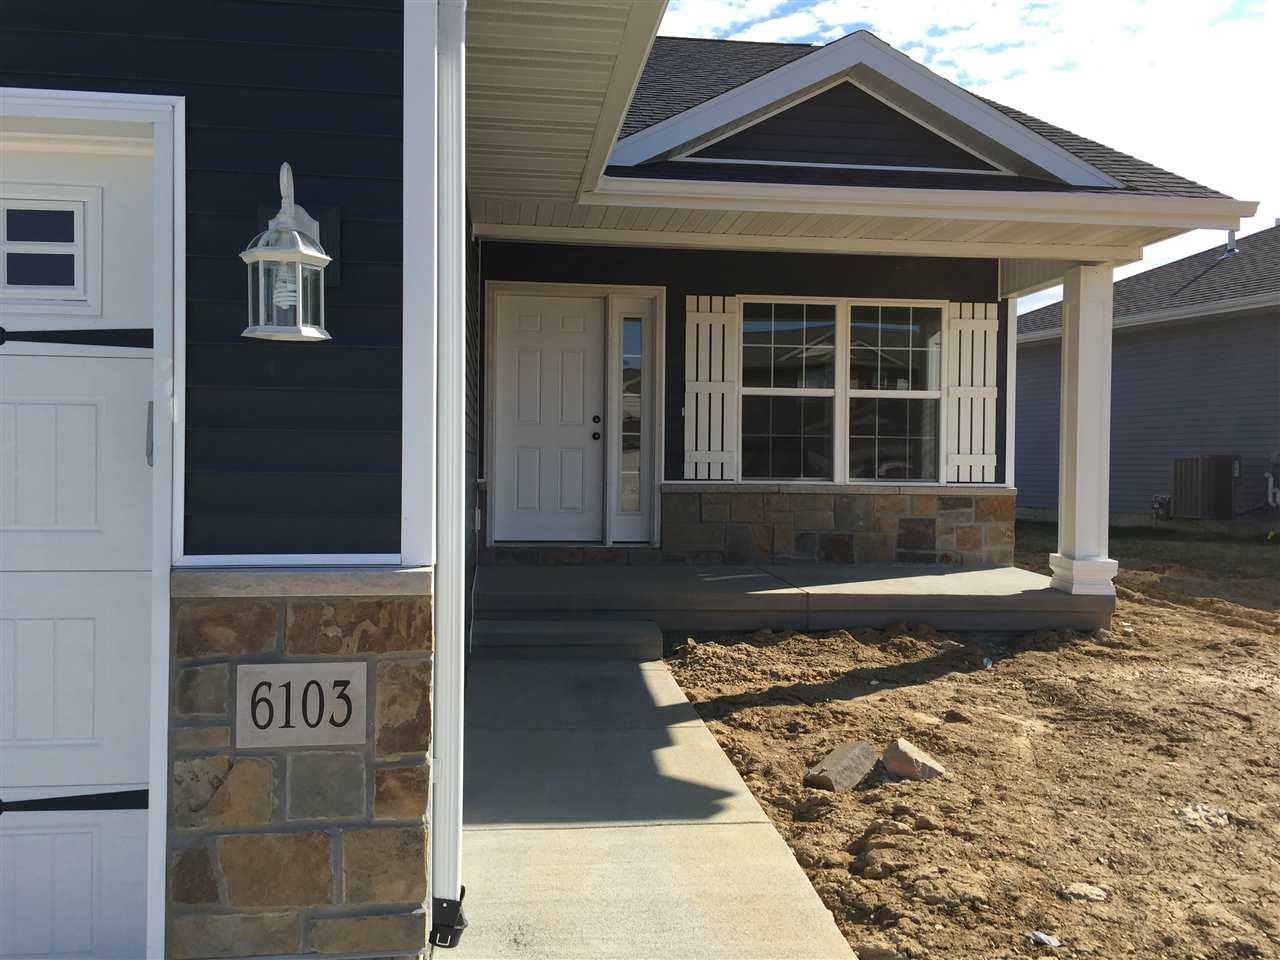 Real Estate for Sale, ListingId: 30522909, Davenport,IA52807